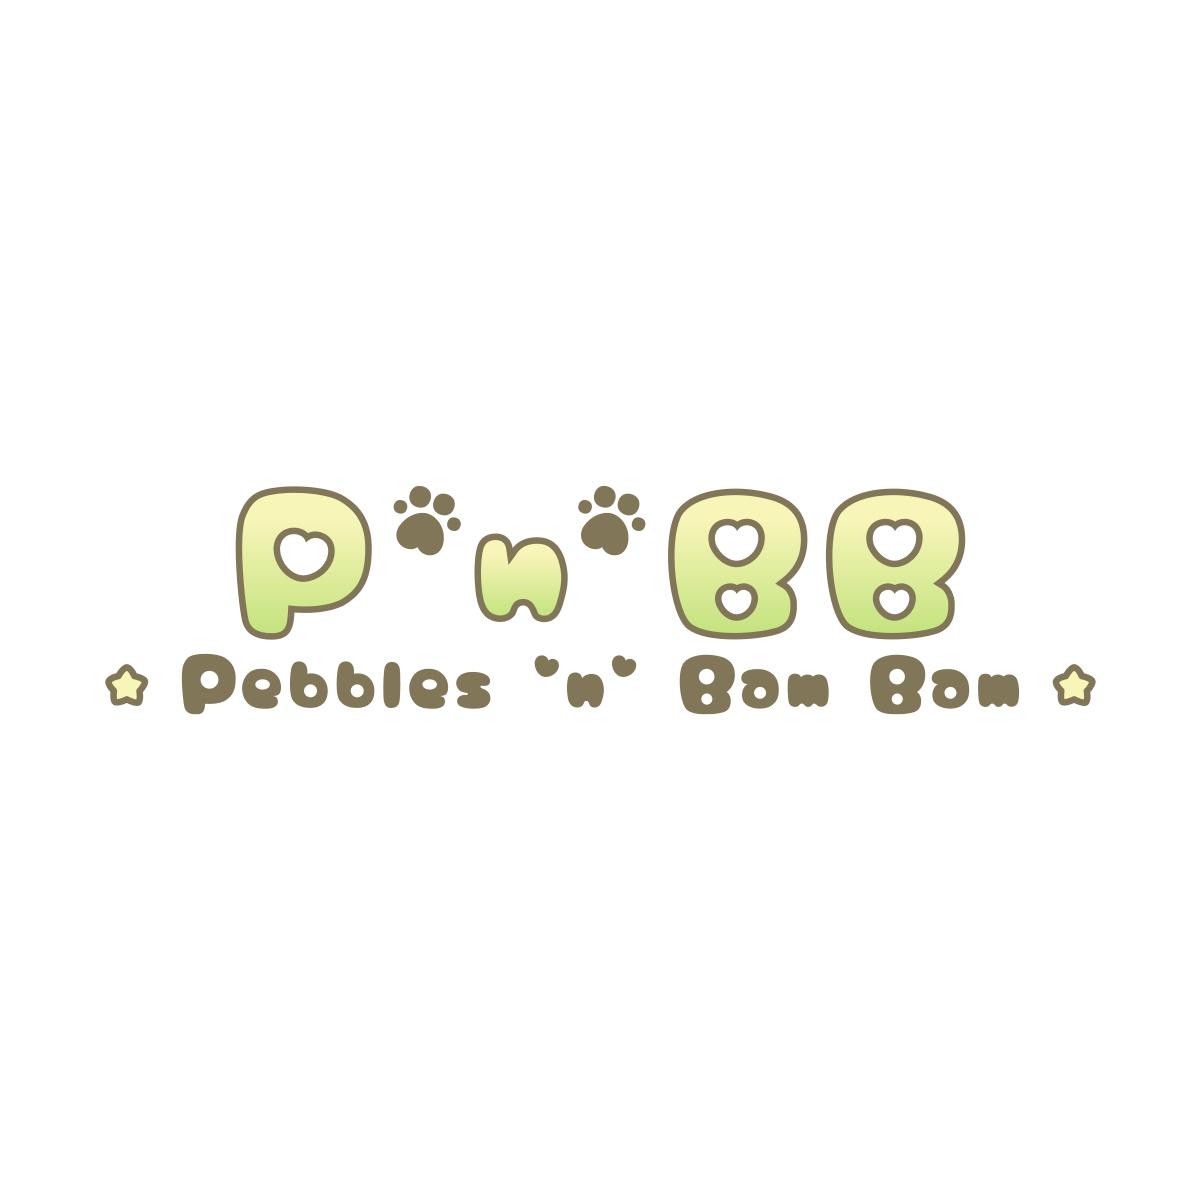 pf00001